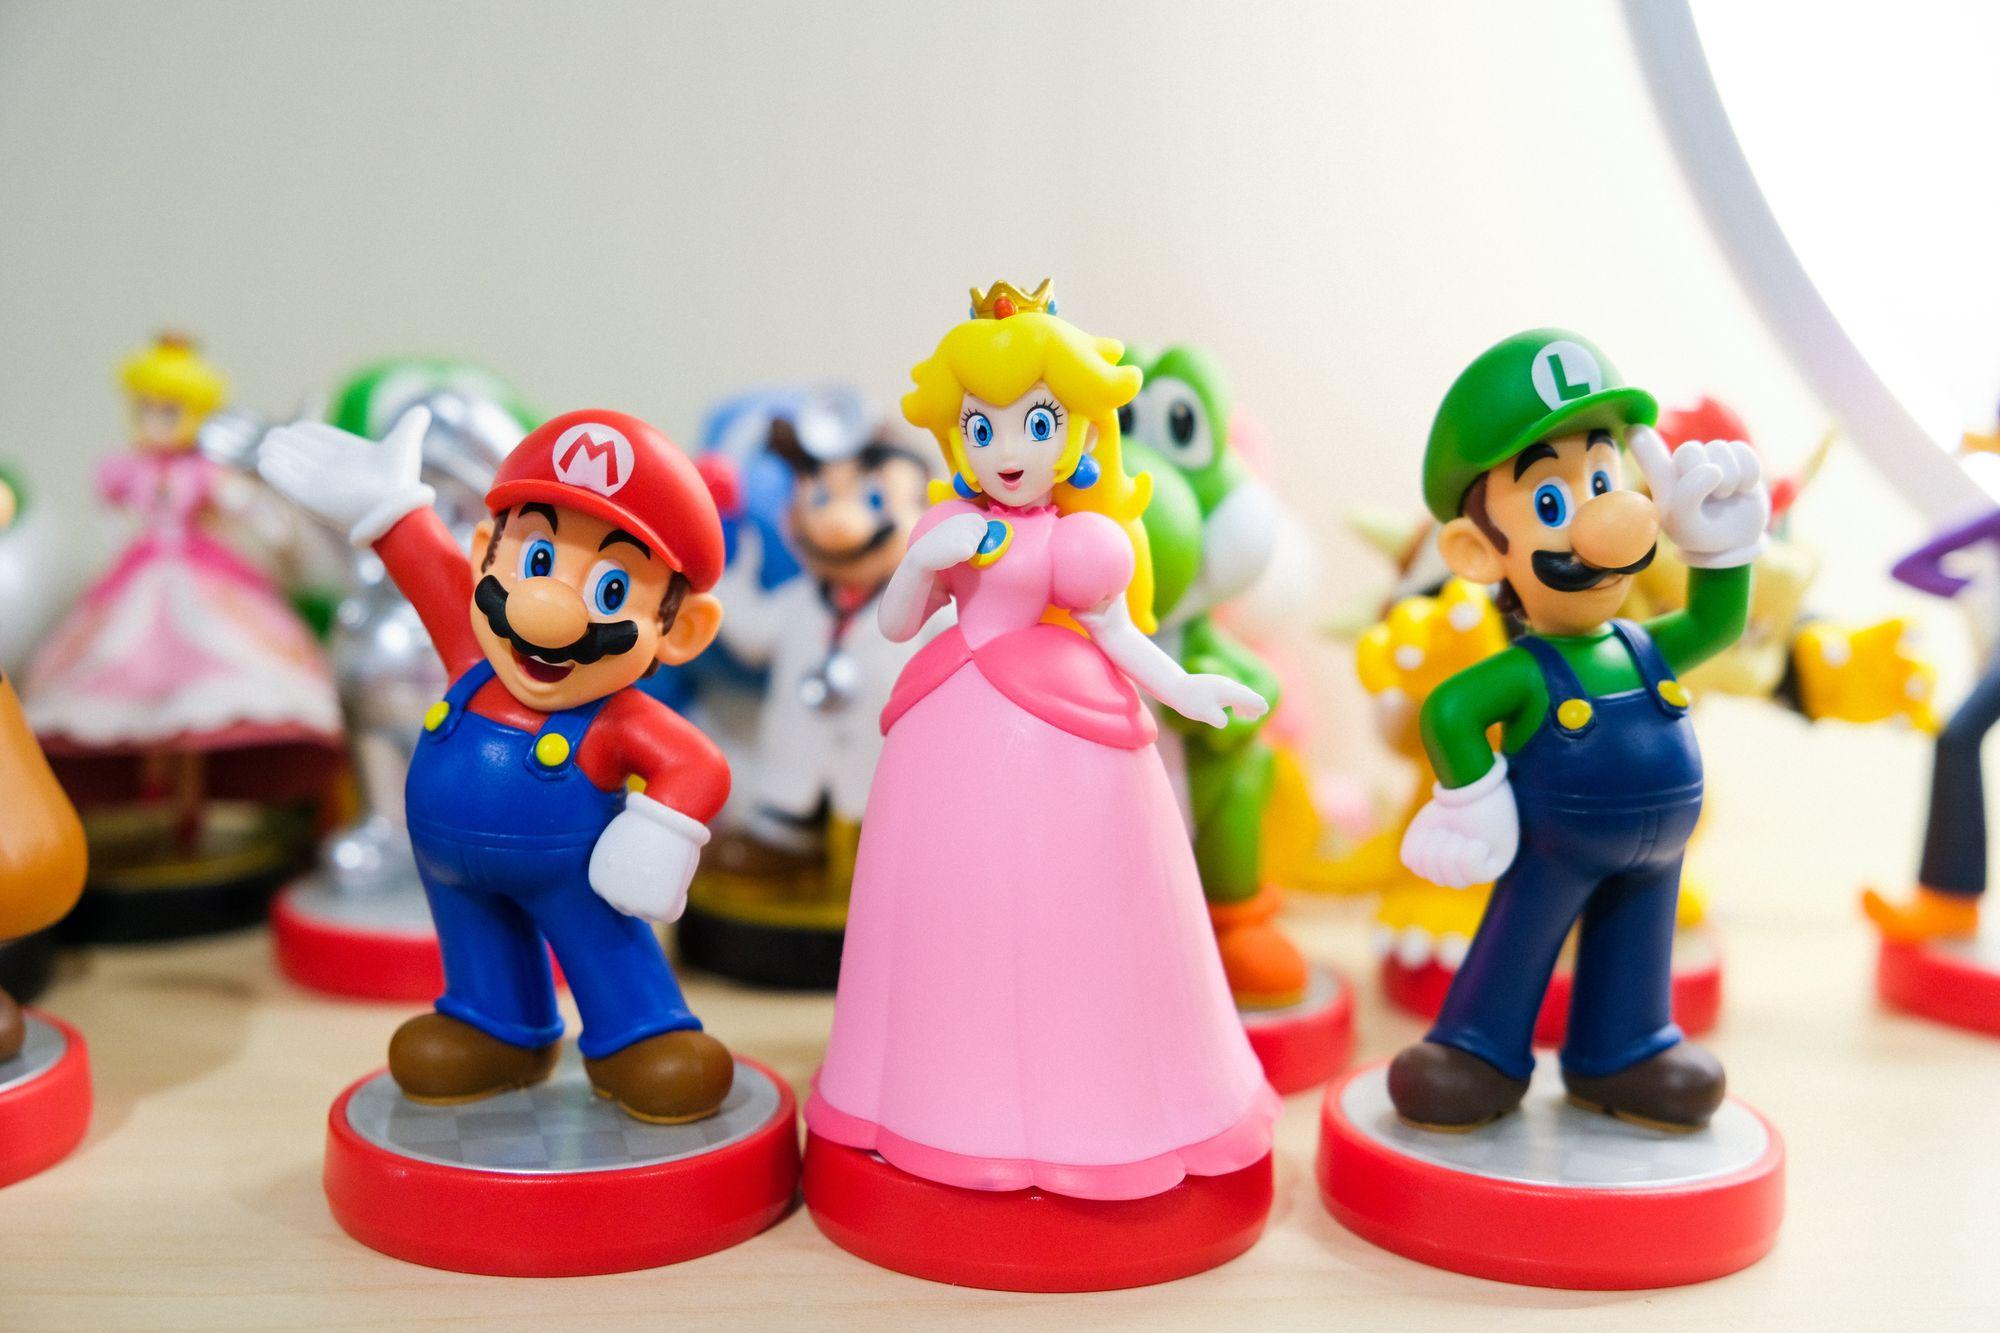 Figurines Nintendo - Photo de Ryan Quintal sur Unsplash